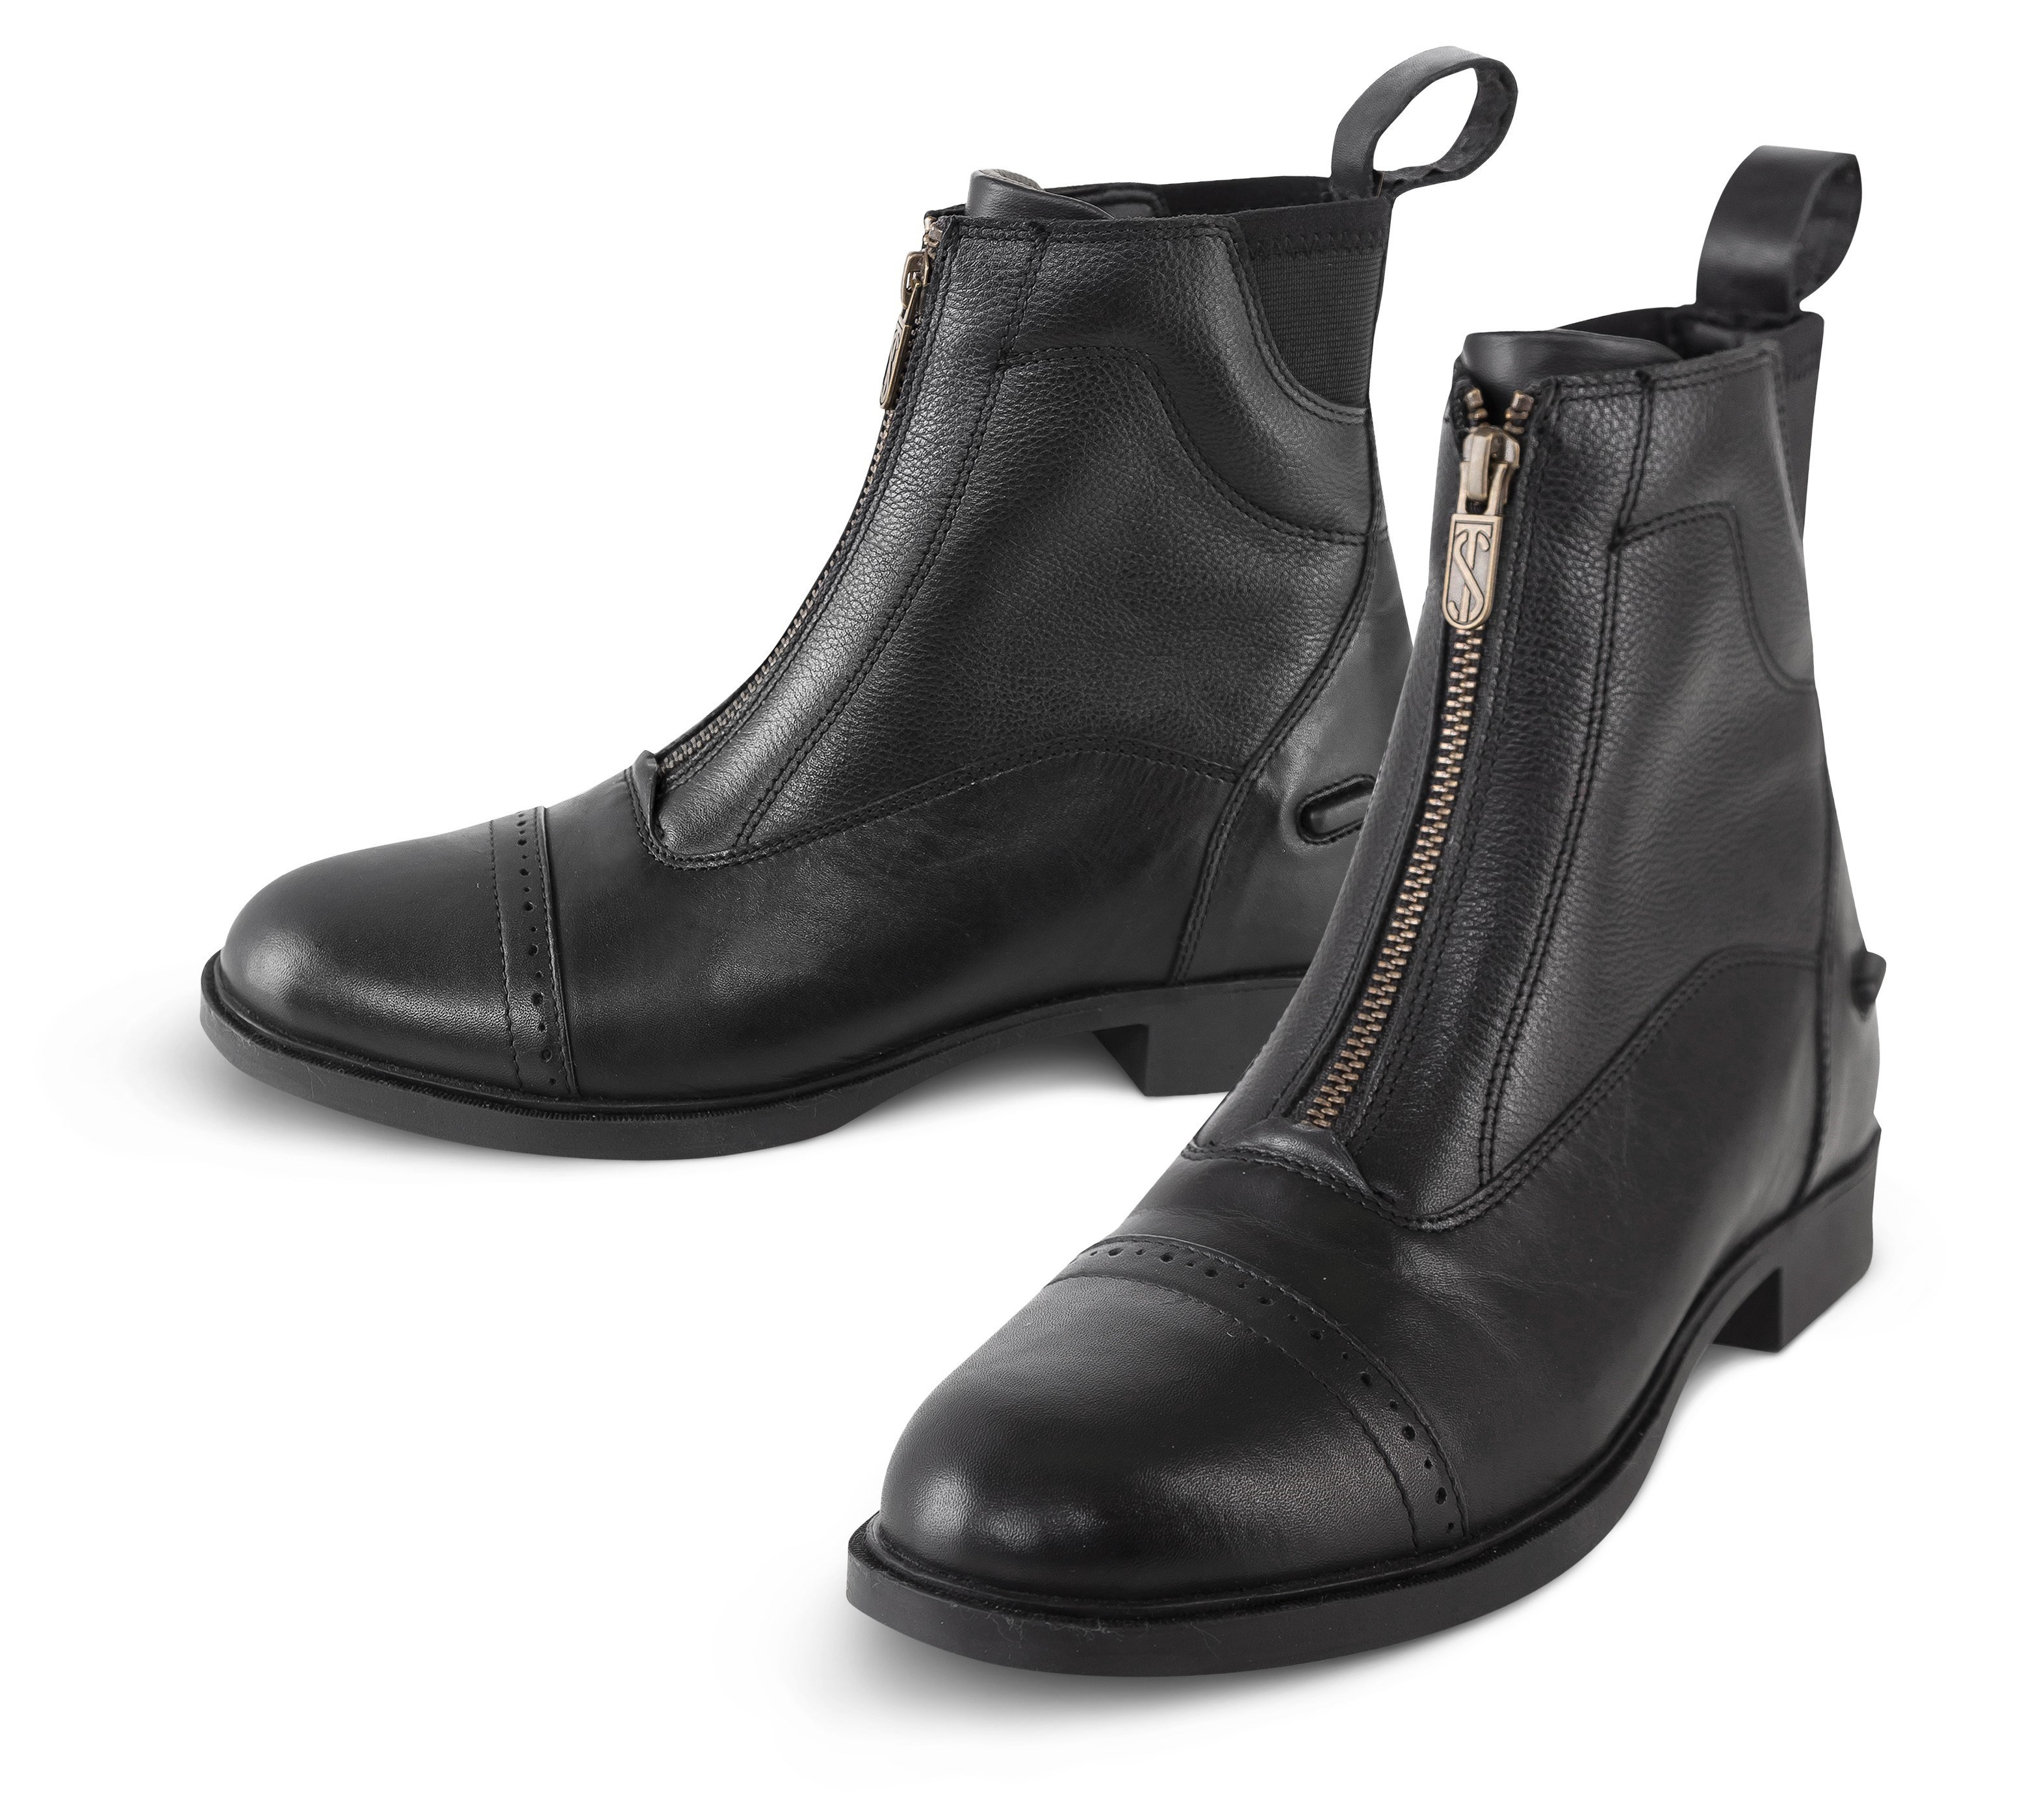 Avant Tredstep Giotto Boots Cuir Équitation Ii Zip RTHntY